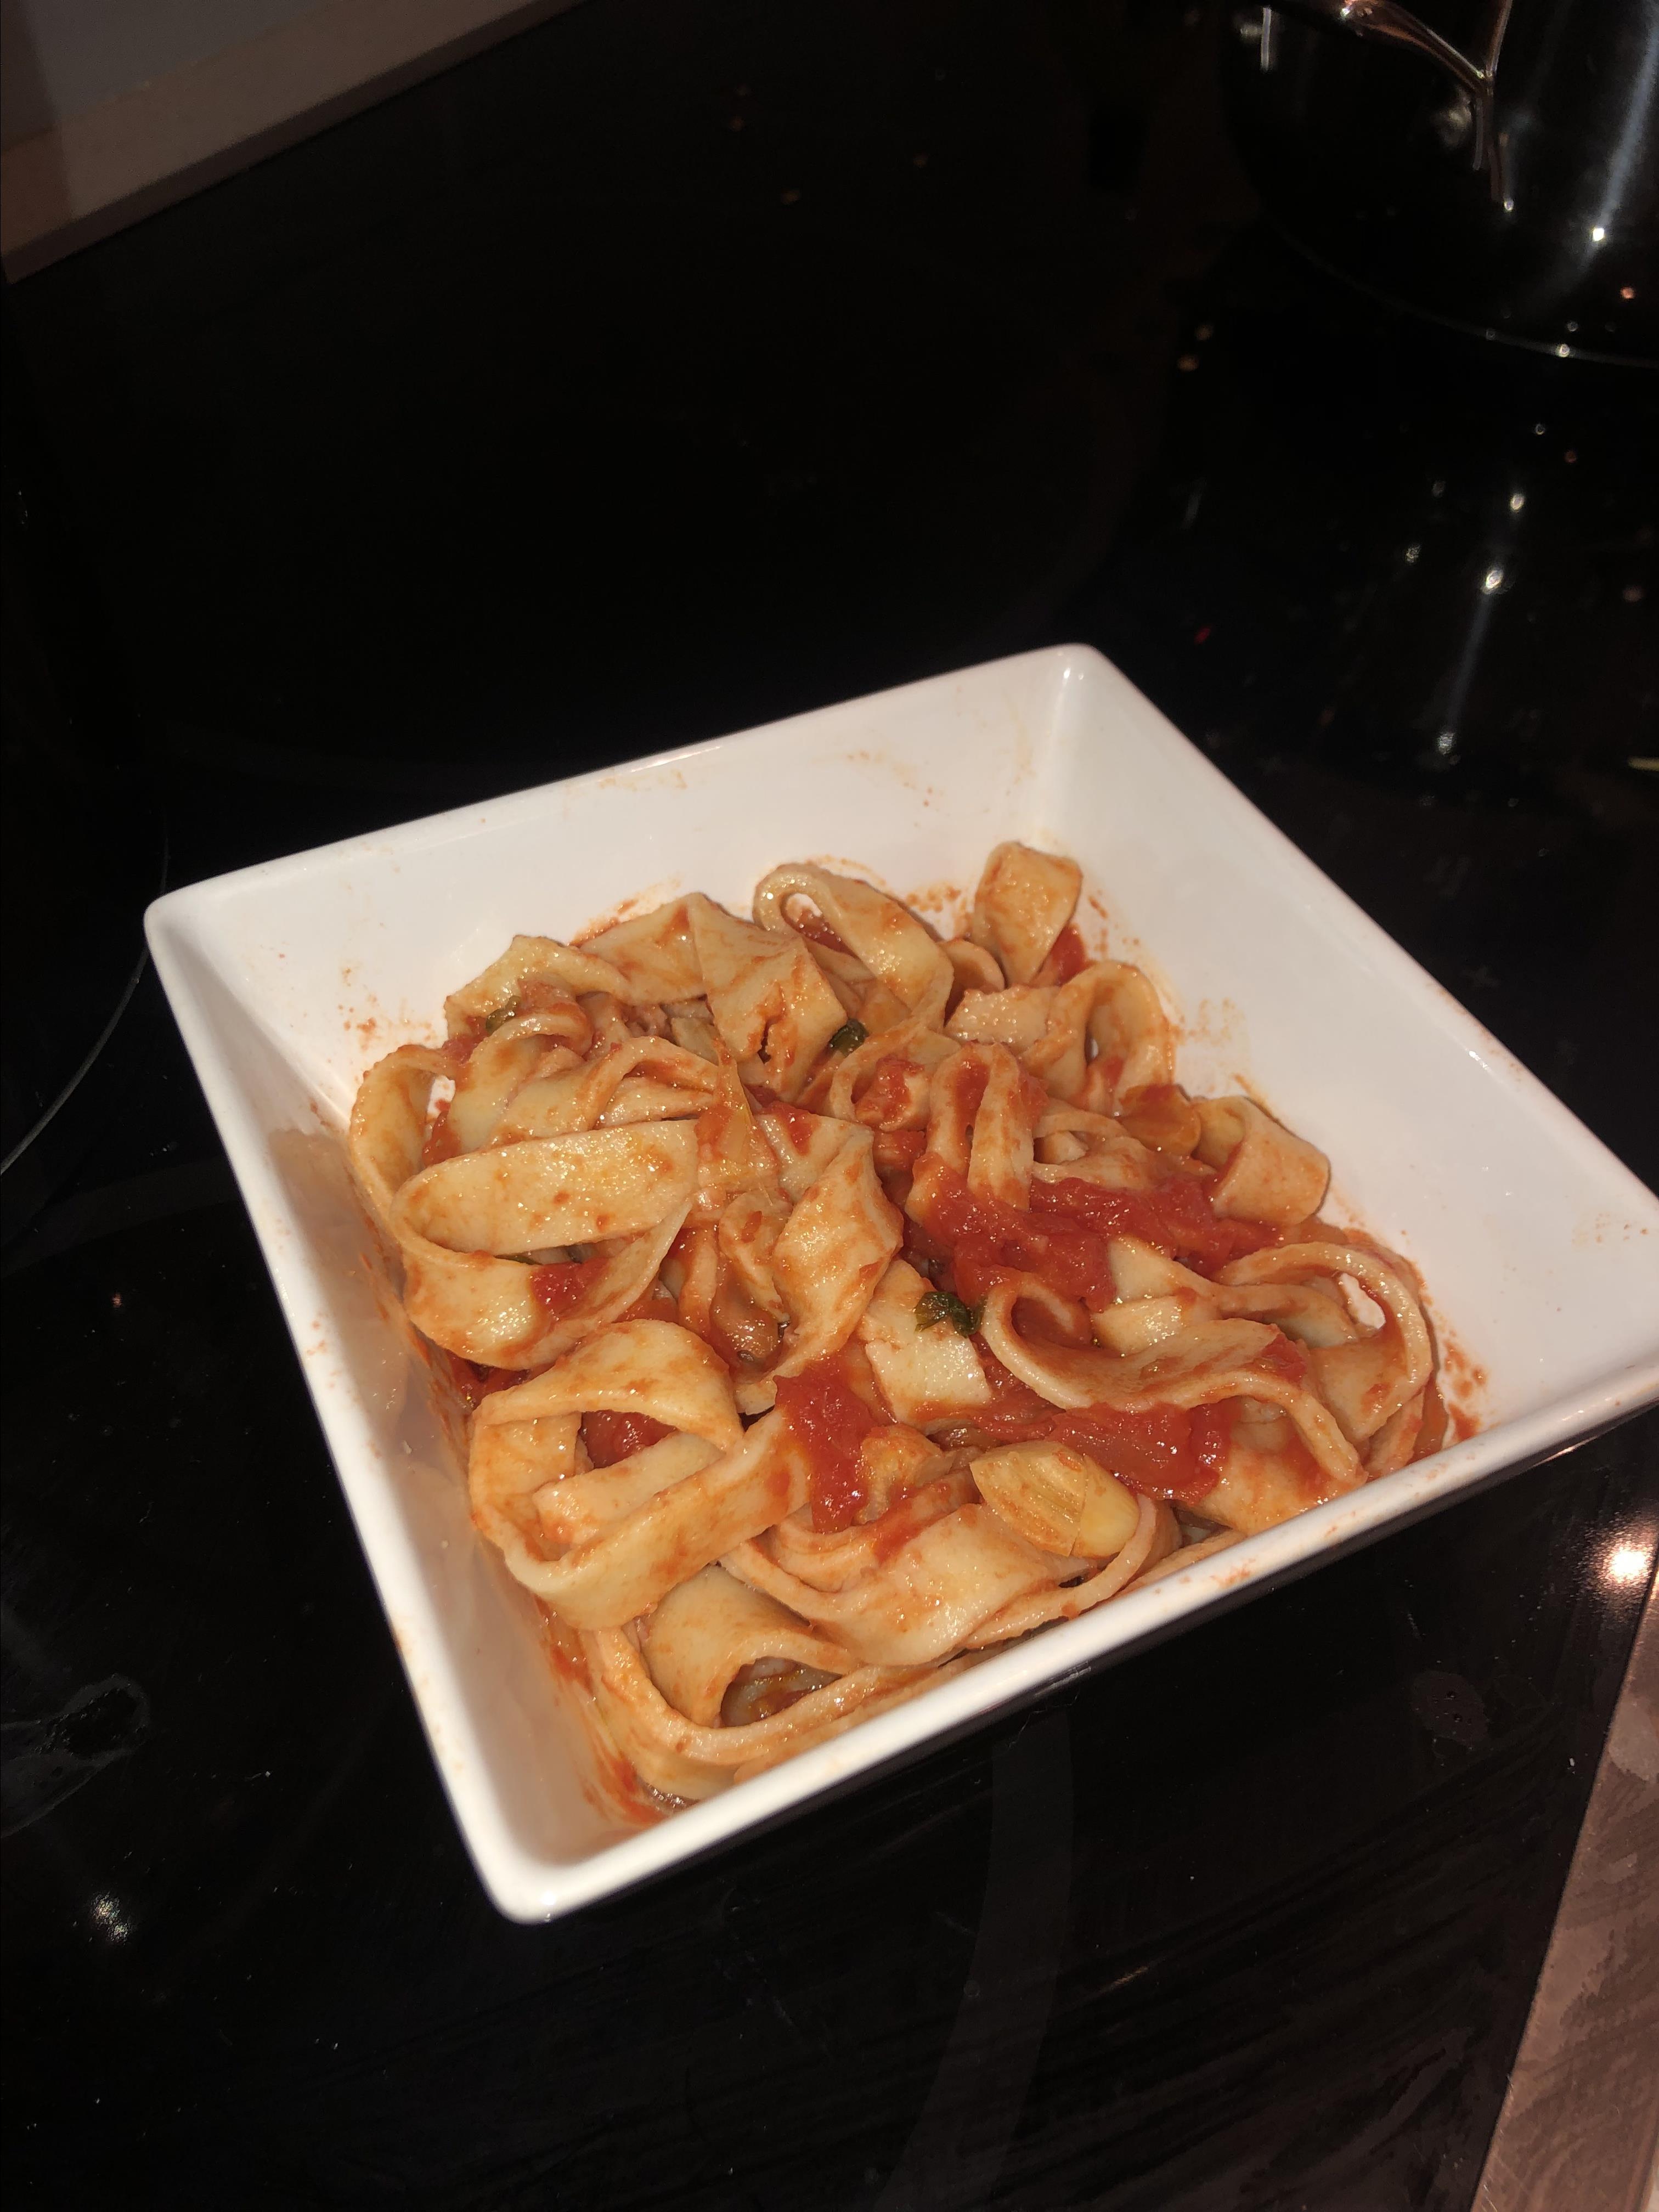 Sugo di Pomodoro (Authentic Italian Tomato Sauce) Rachel Harfst